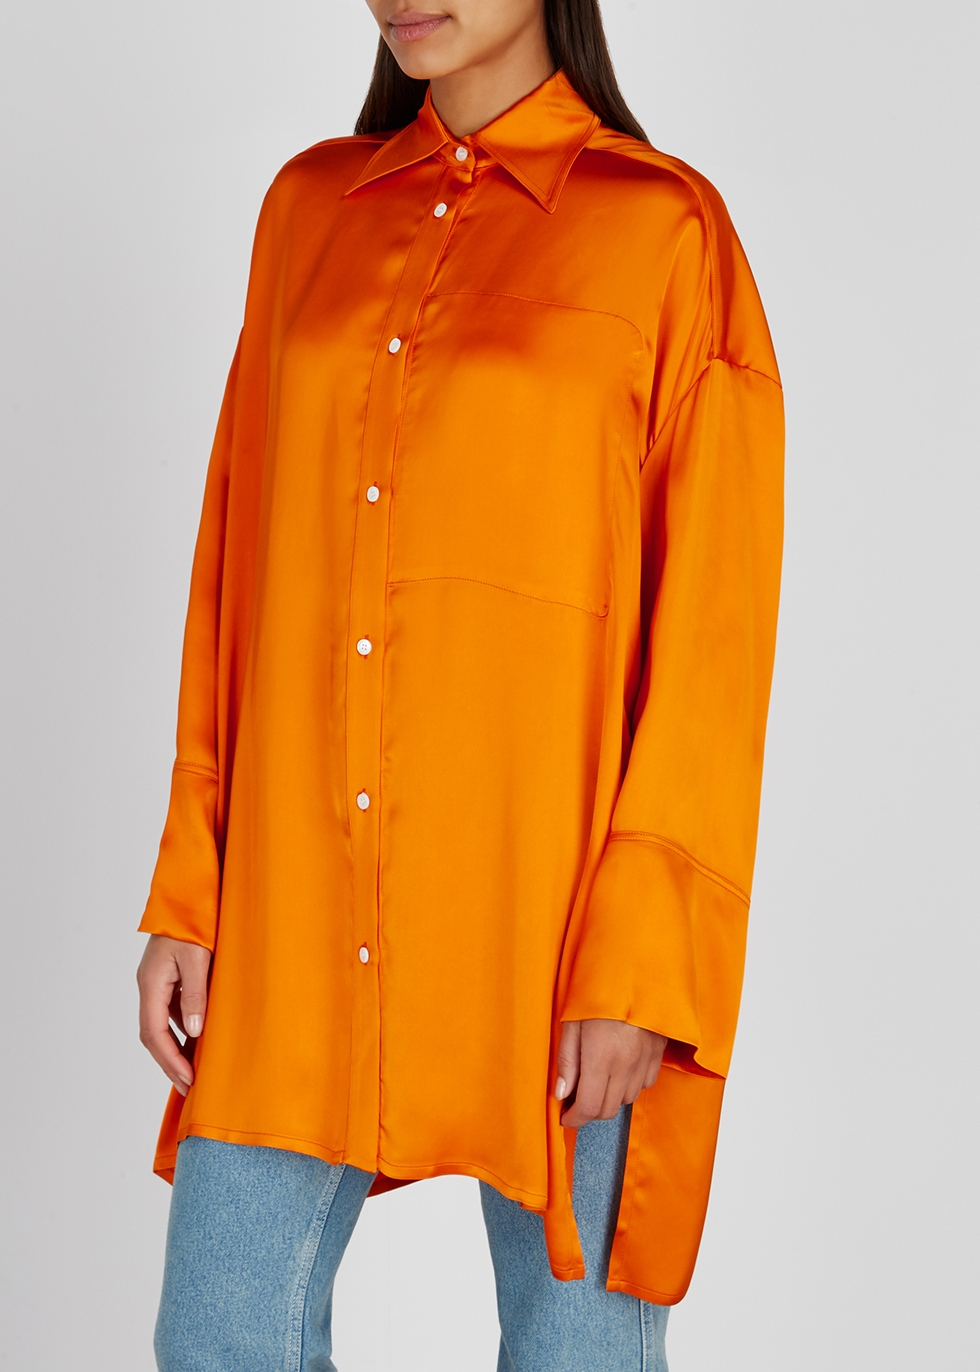 Orange oversized satin shirt - Loewe